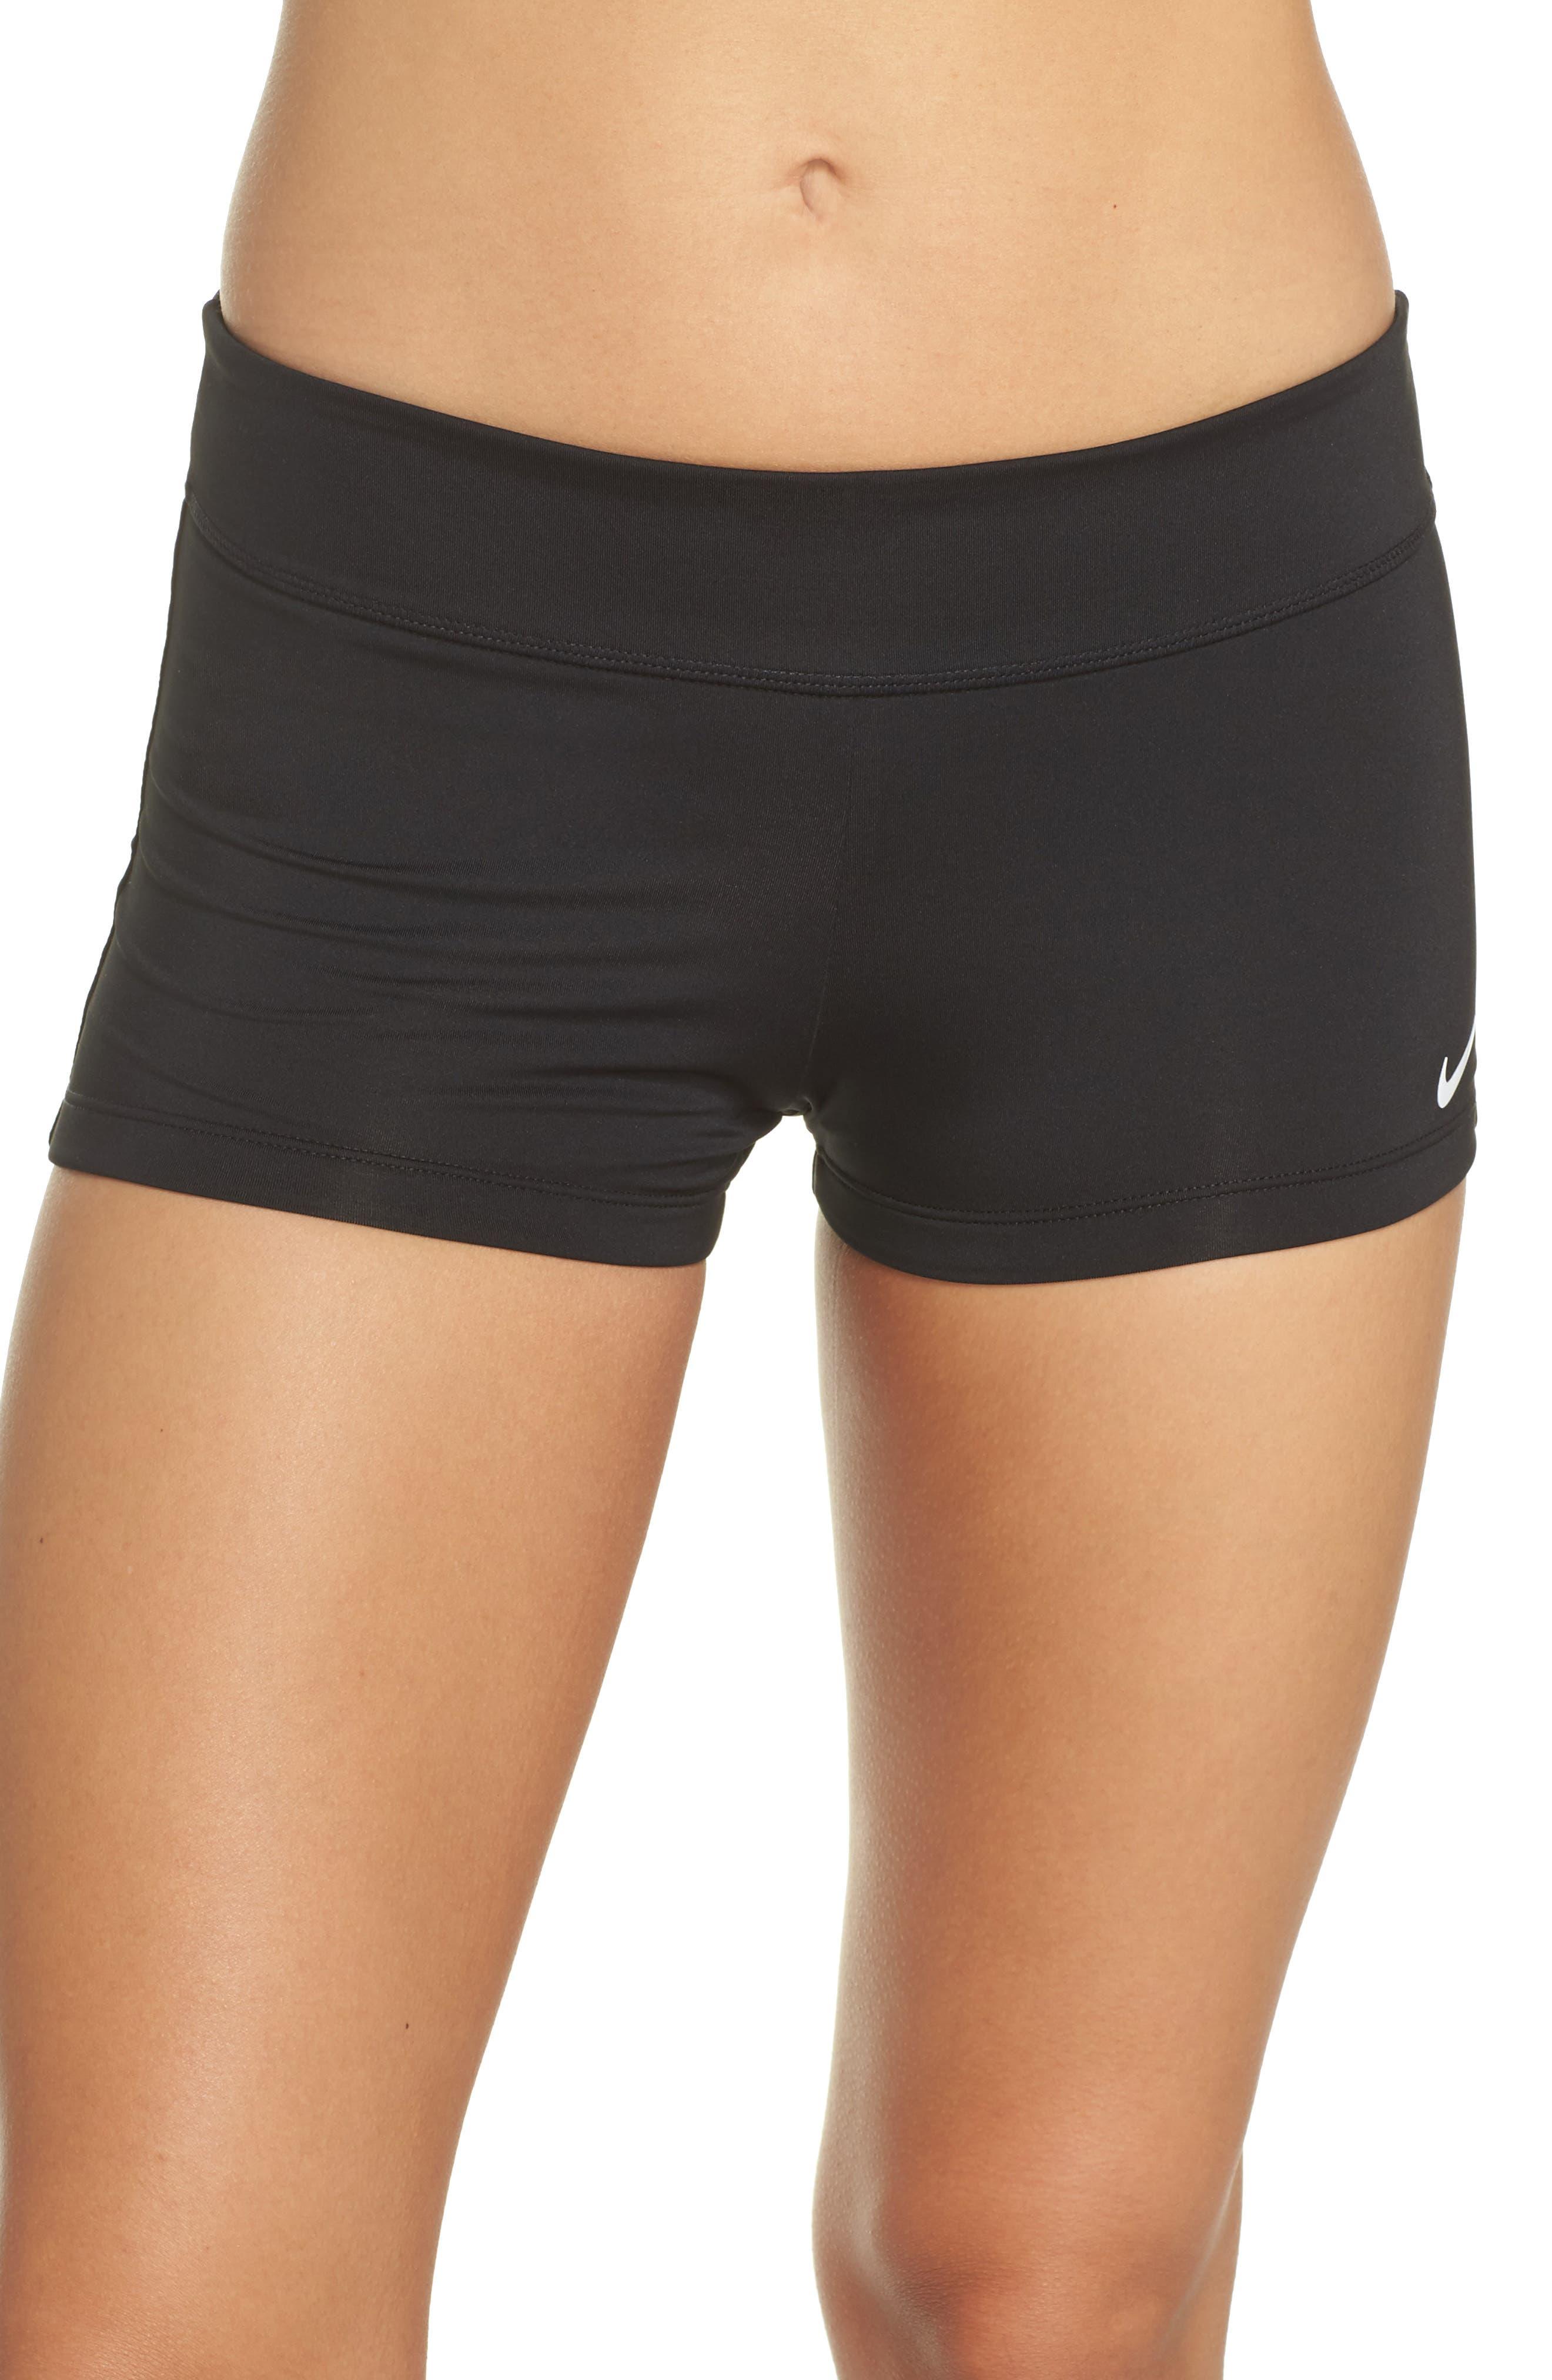 Swim Kick Shorts,                         Main,                         color,